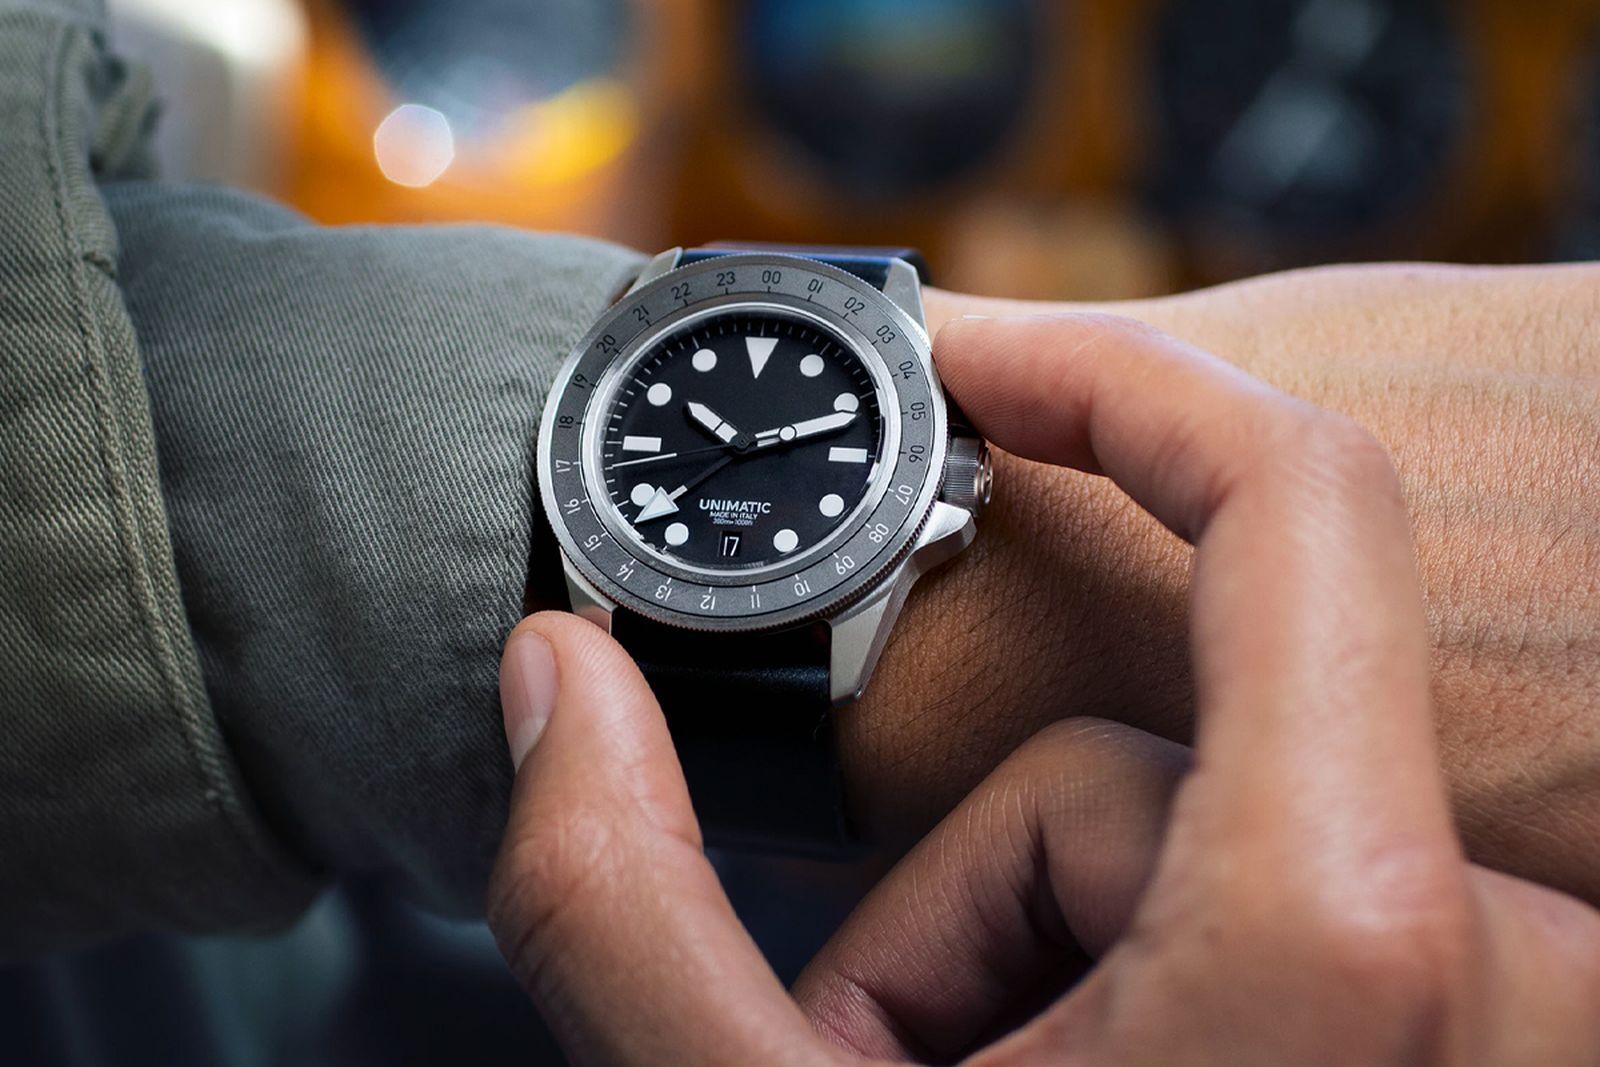 hodinkee-unimatic-price-release-date-main